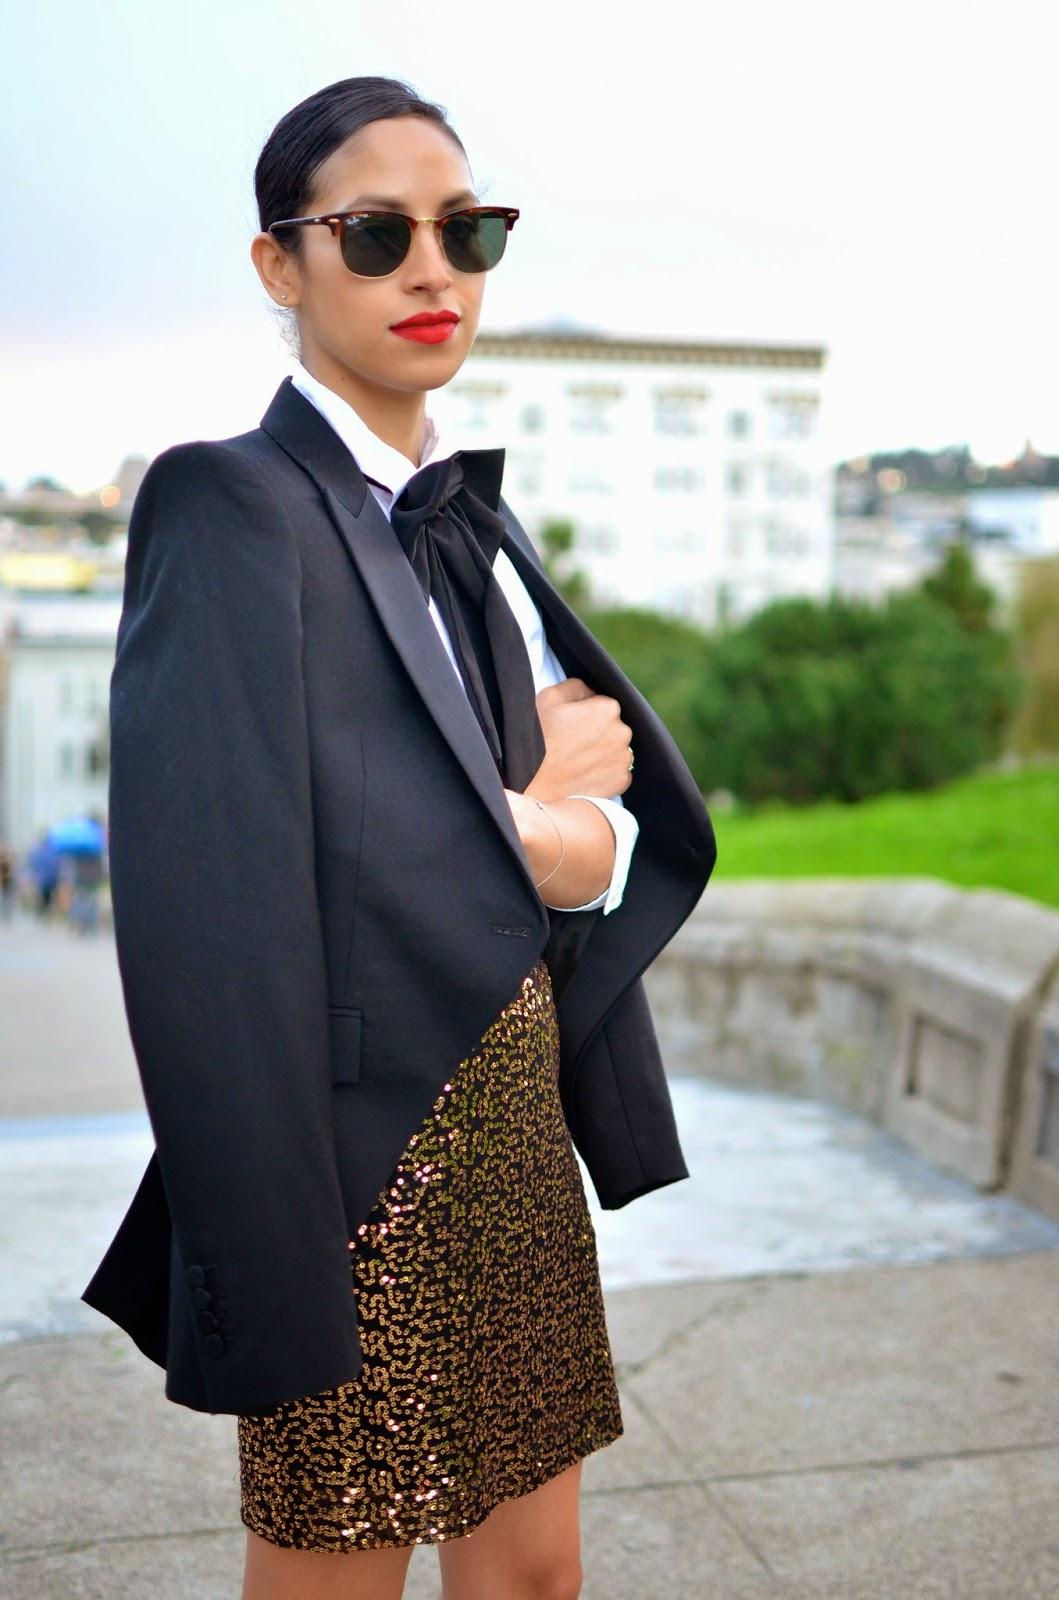 NYE look, NYE style, tux blazer, lady bowtie, style in the city